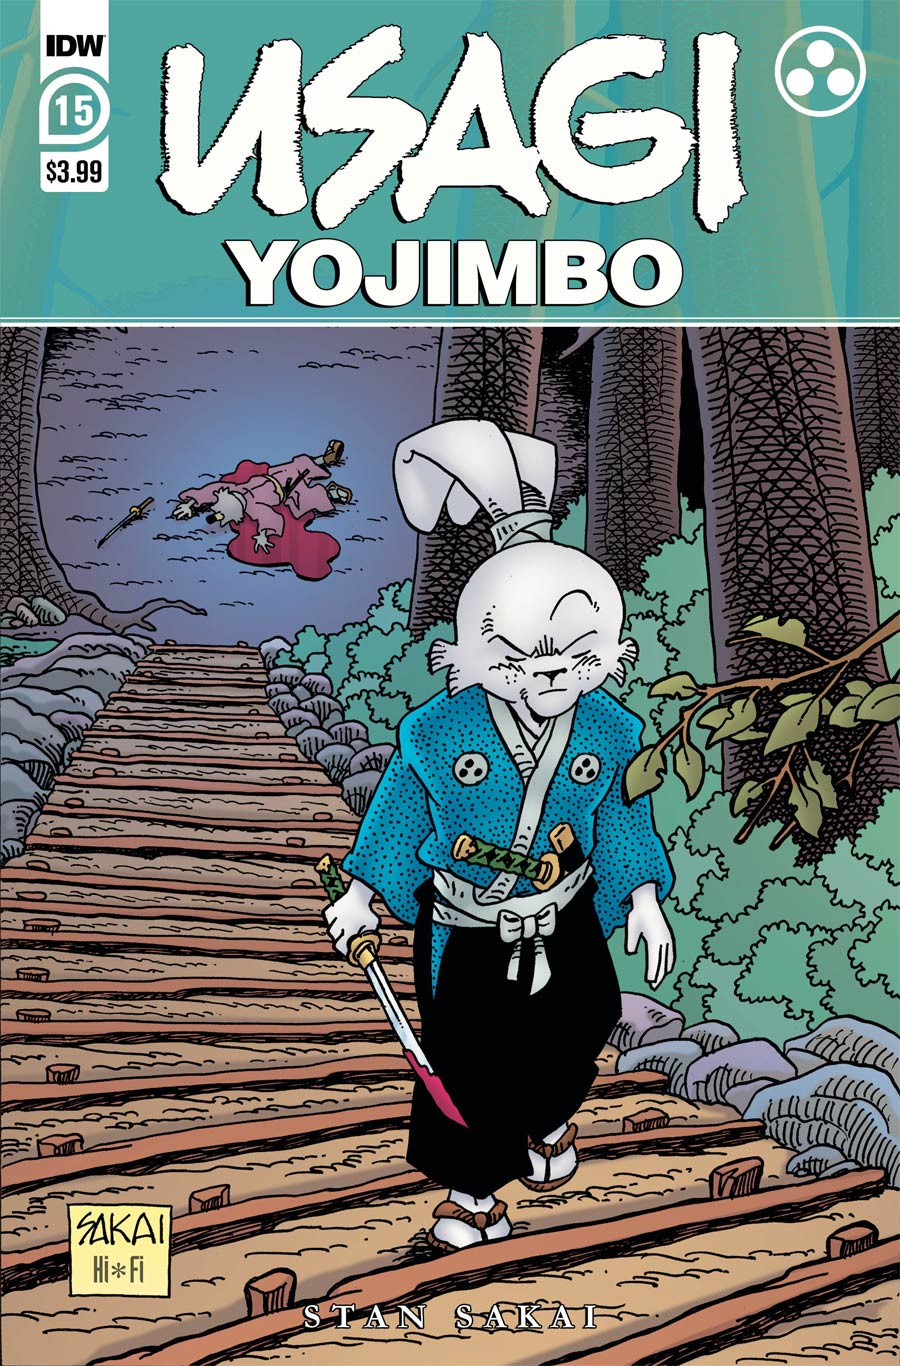 Usagi Yojimbo Vol 4 #15 Cover A Regular Stan Sakai Cover